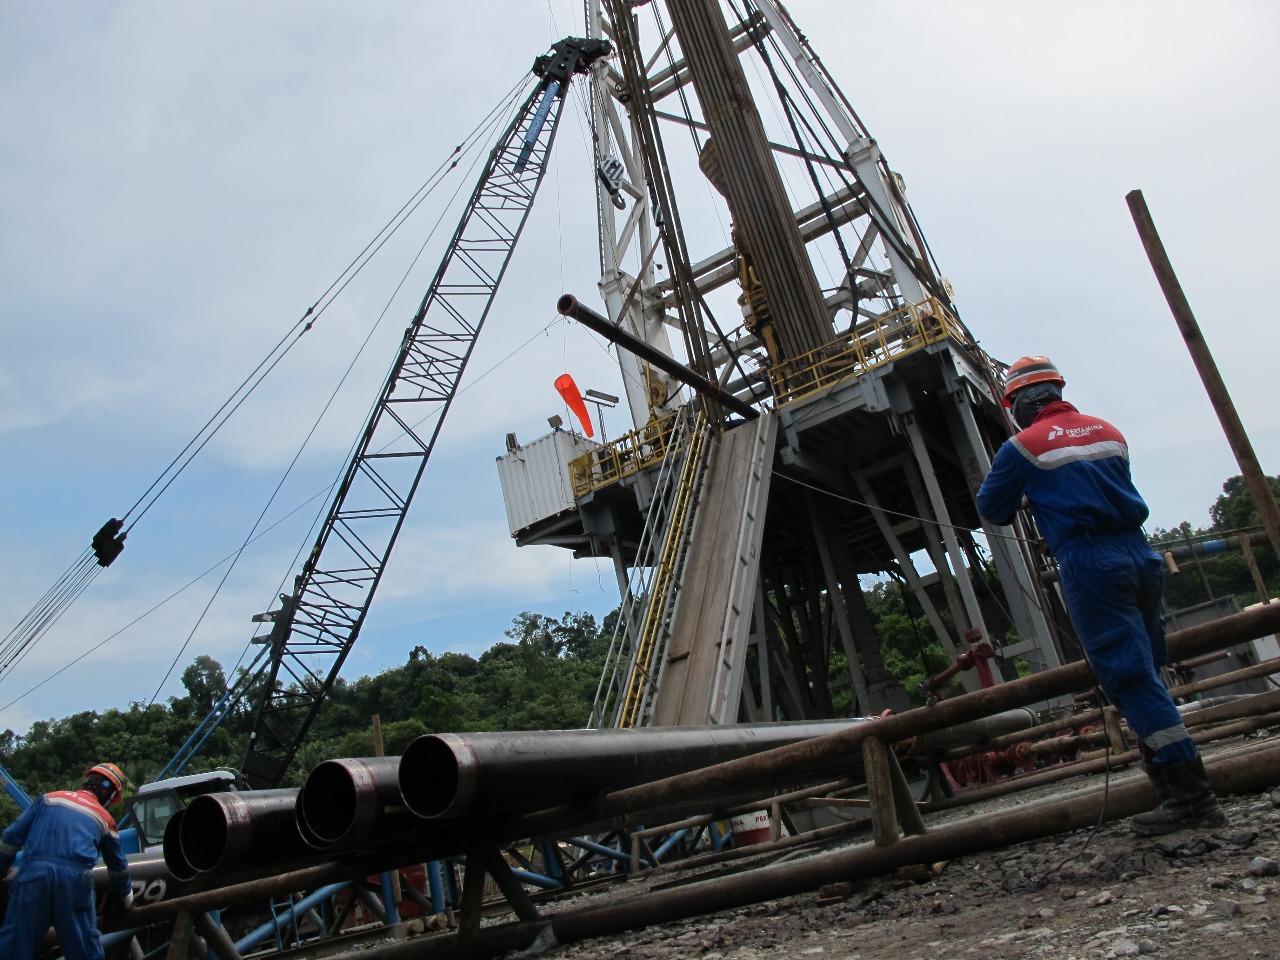 https: img.okeinfo.net content 2019 07 22 320 2082225 tim-ahli-investigasi-tumpahan-minyak-pertamina-di-laut-utara-jawa-KSk13YSiWU.jpeg